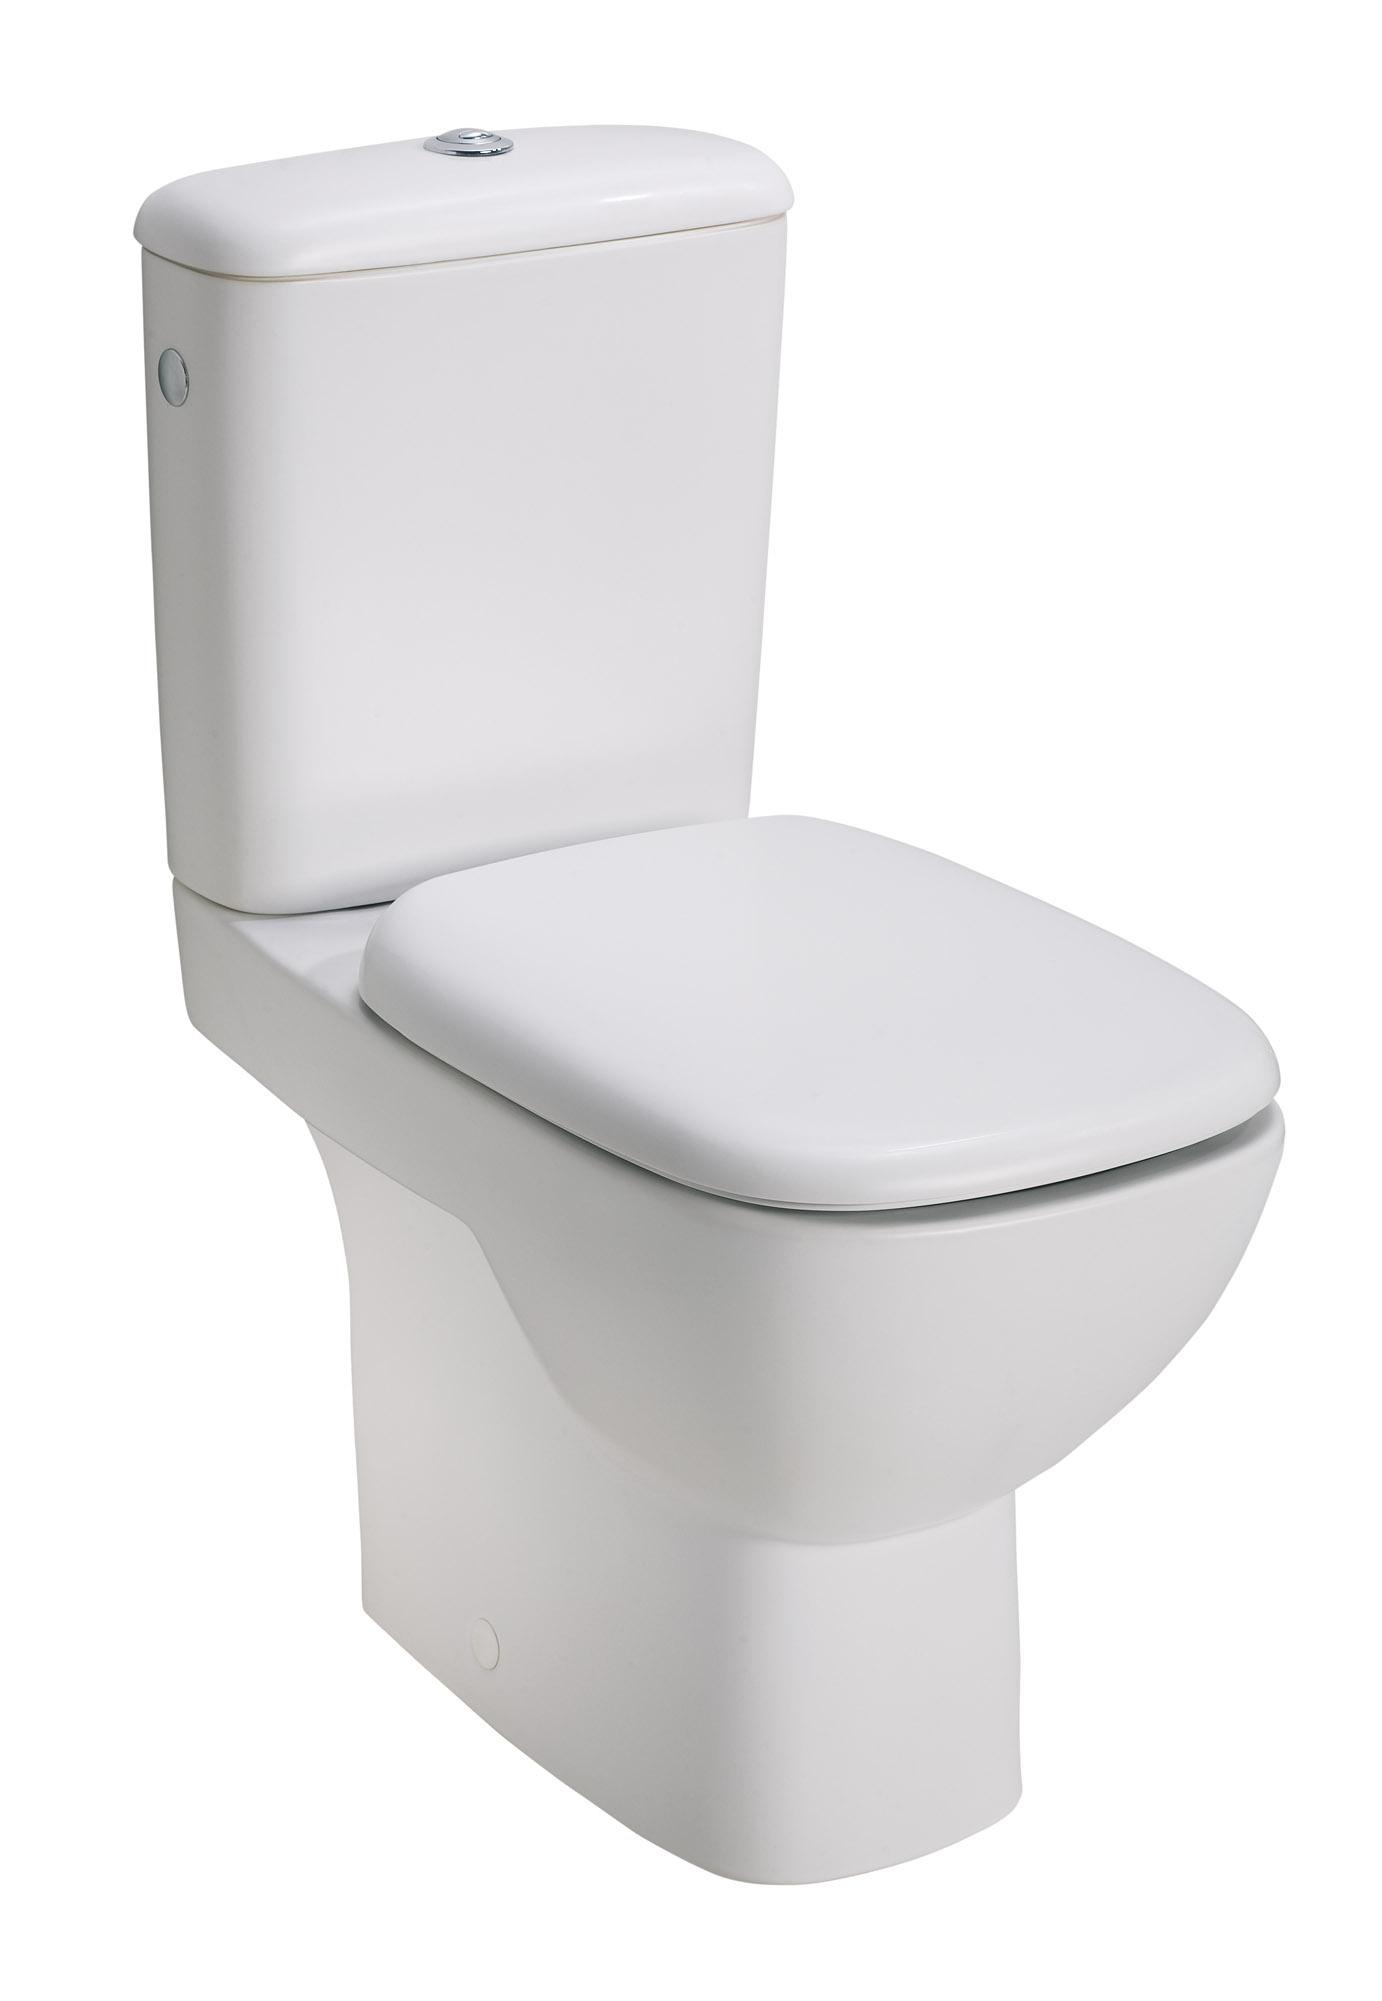 wc/klozety KOLO Style L29000 900 WC kombi Reflex